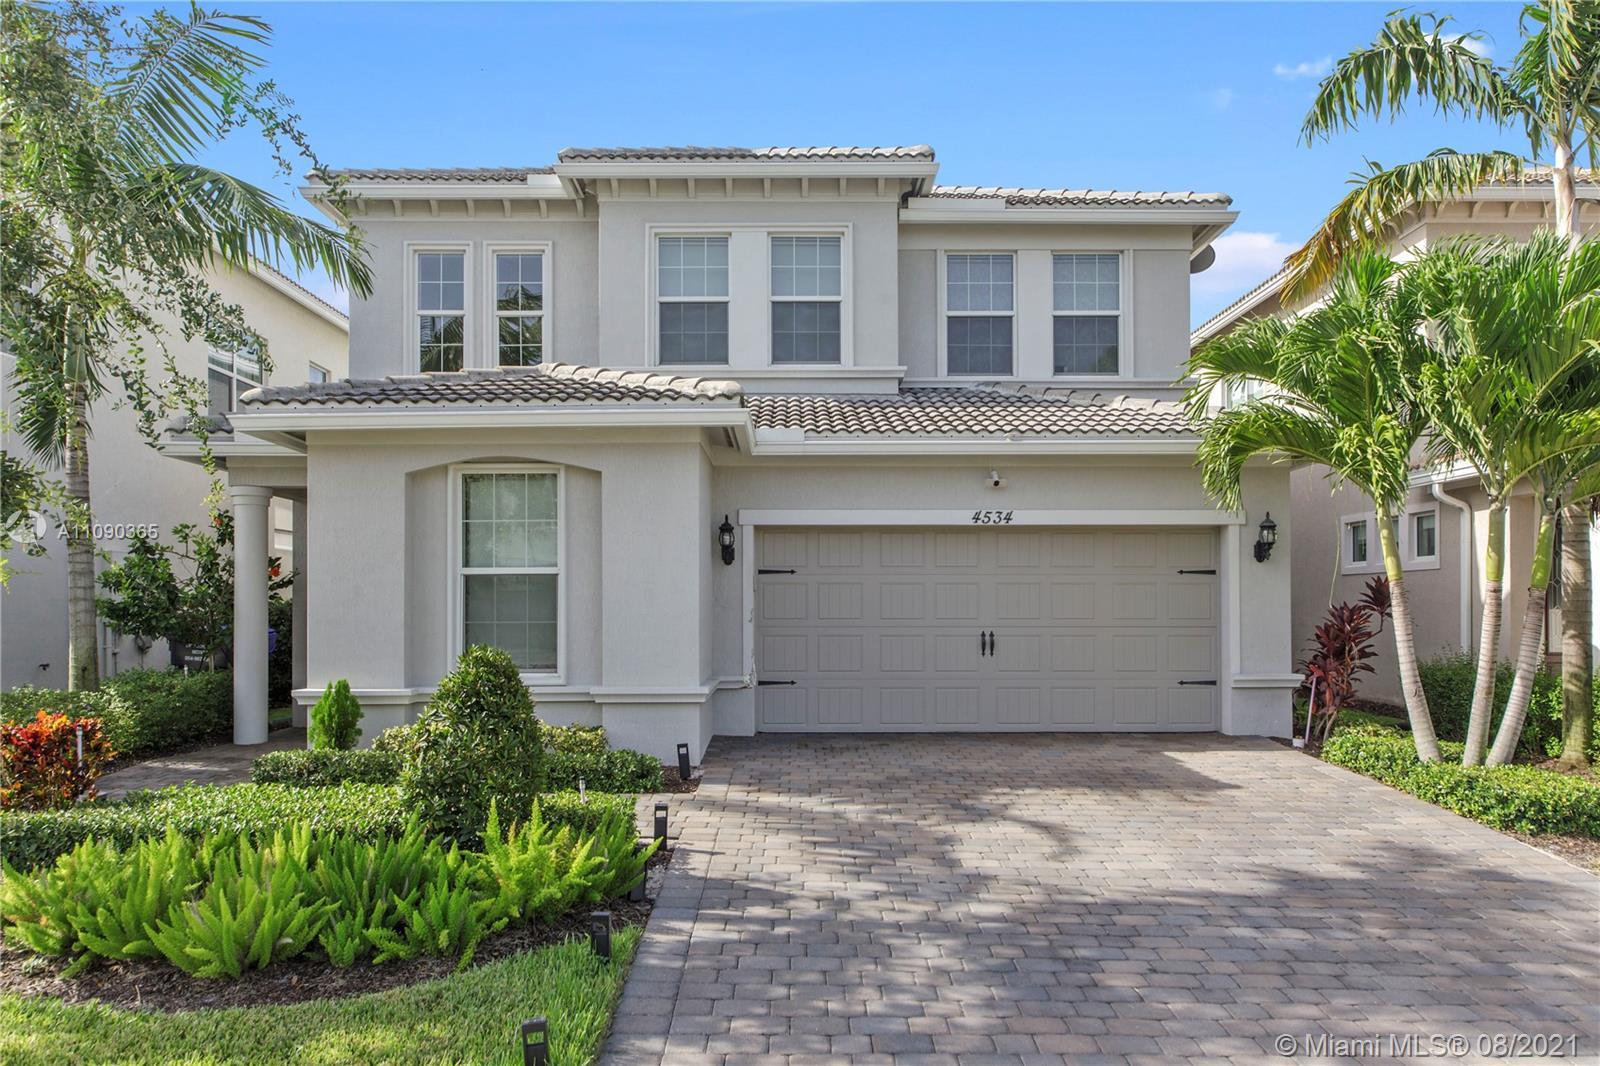 Parkview At Hillcrest - 4534 Greenway Dr, Hollywood, FL 33021